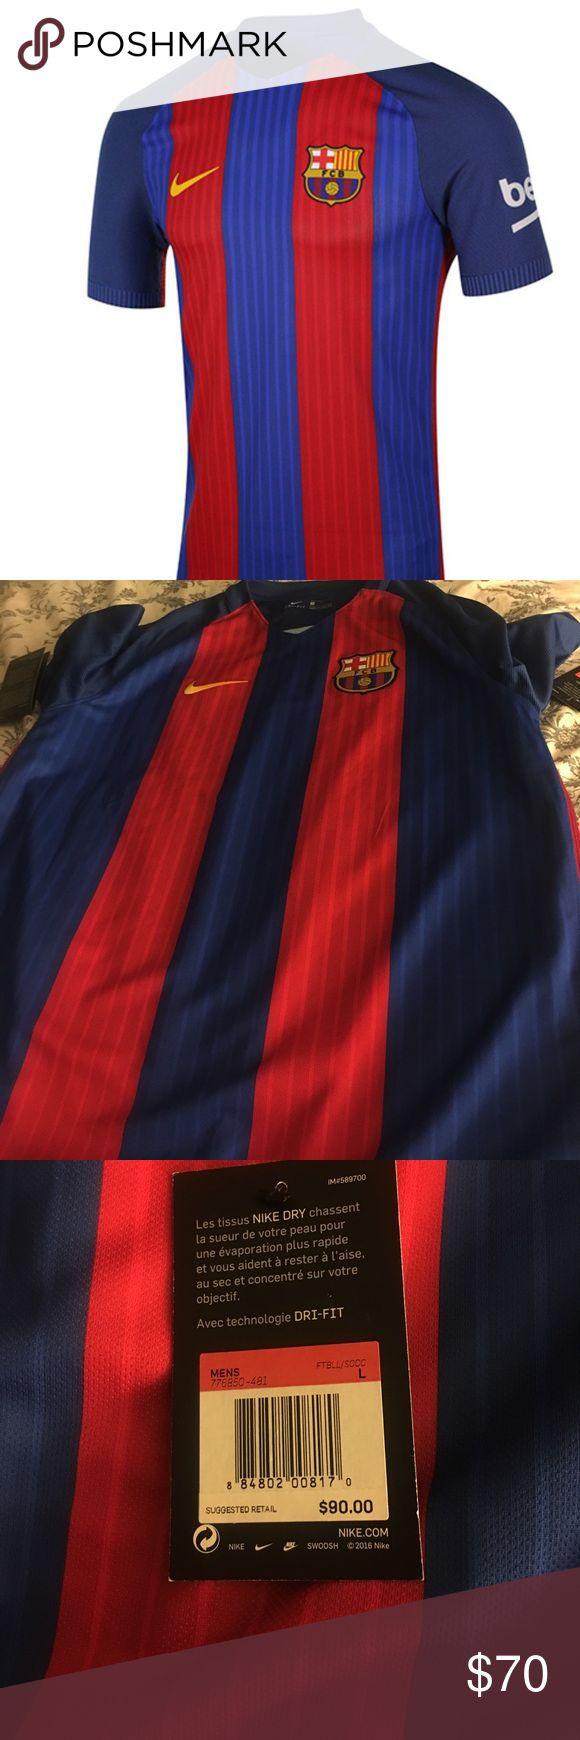 Barcelona jersey Brand new Barcelona jersey Nike Other